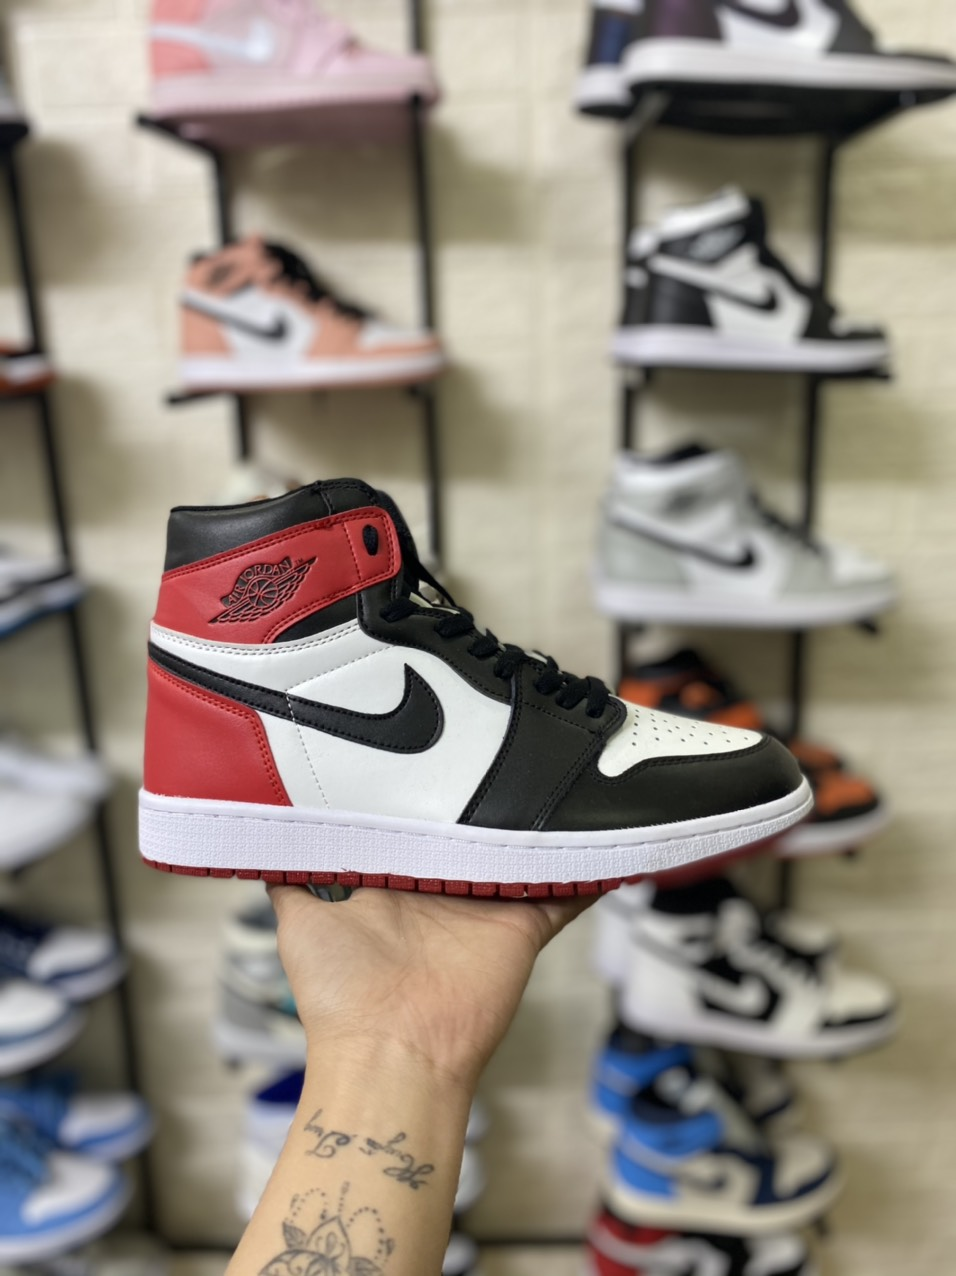 Giày Nike Air Jordan 1 Retro High Satin Black Toe 3